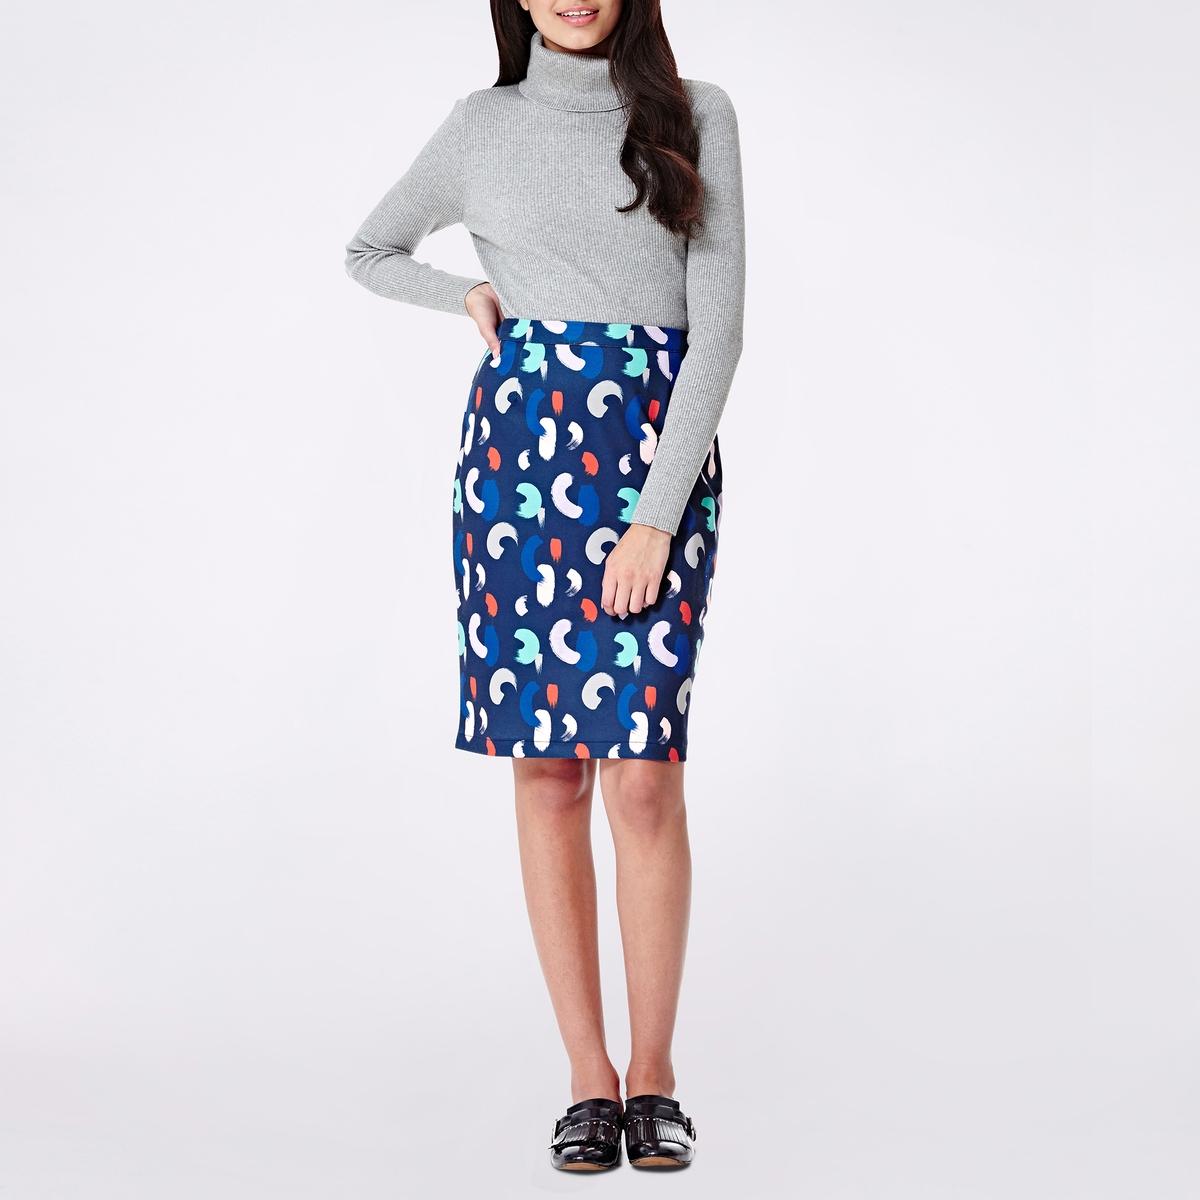 Юбка-футляр с рисунком платье yumi yumi платье